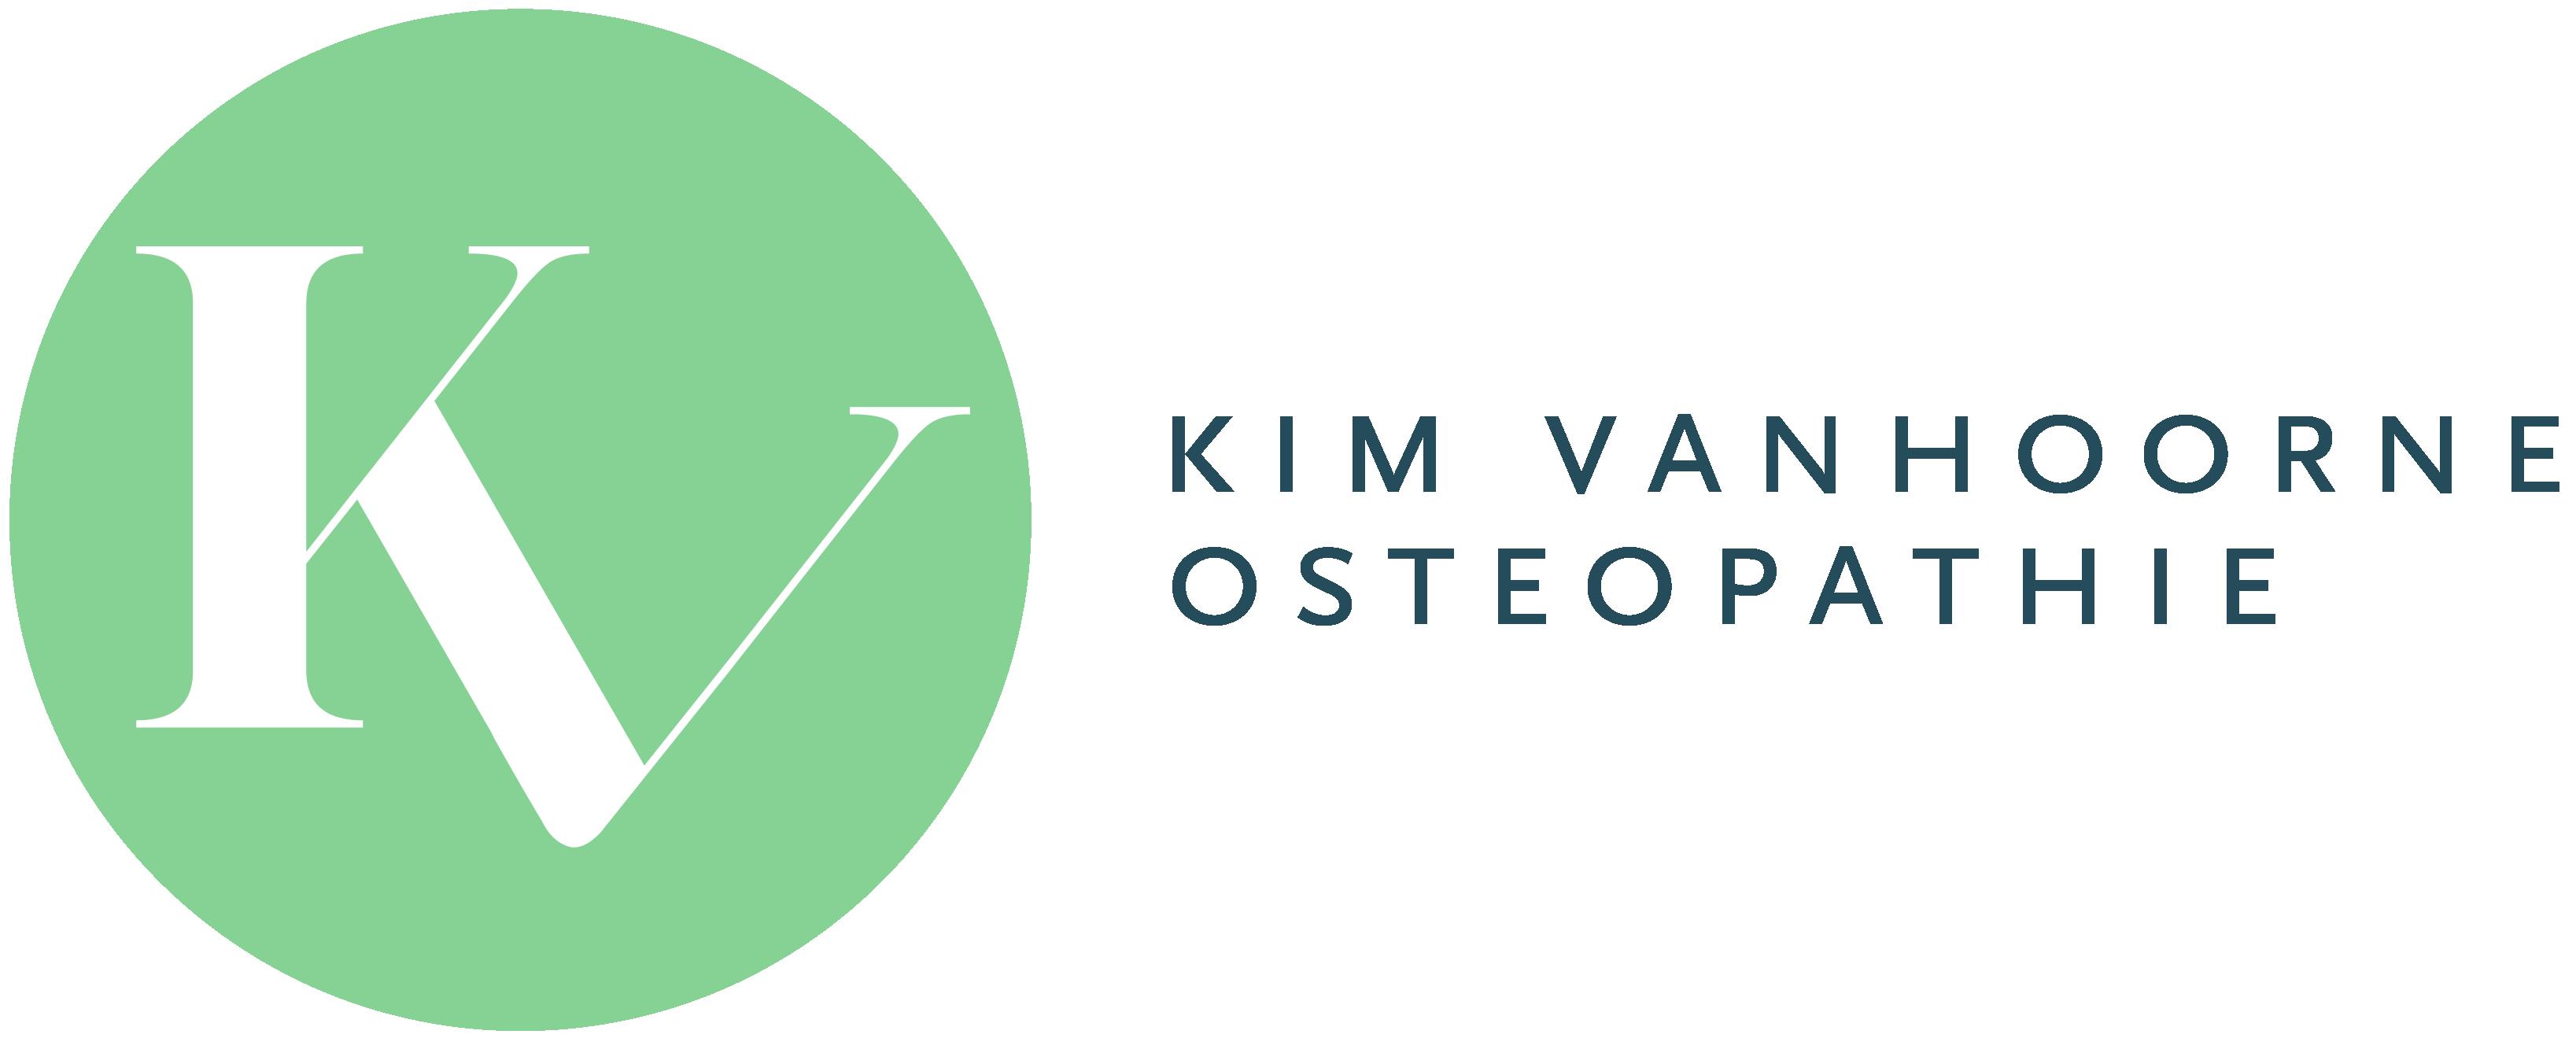 Kim Vanhoorne